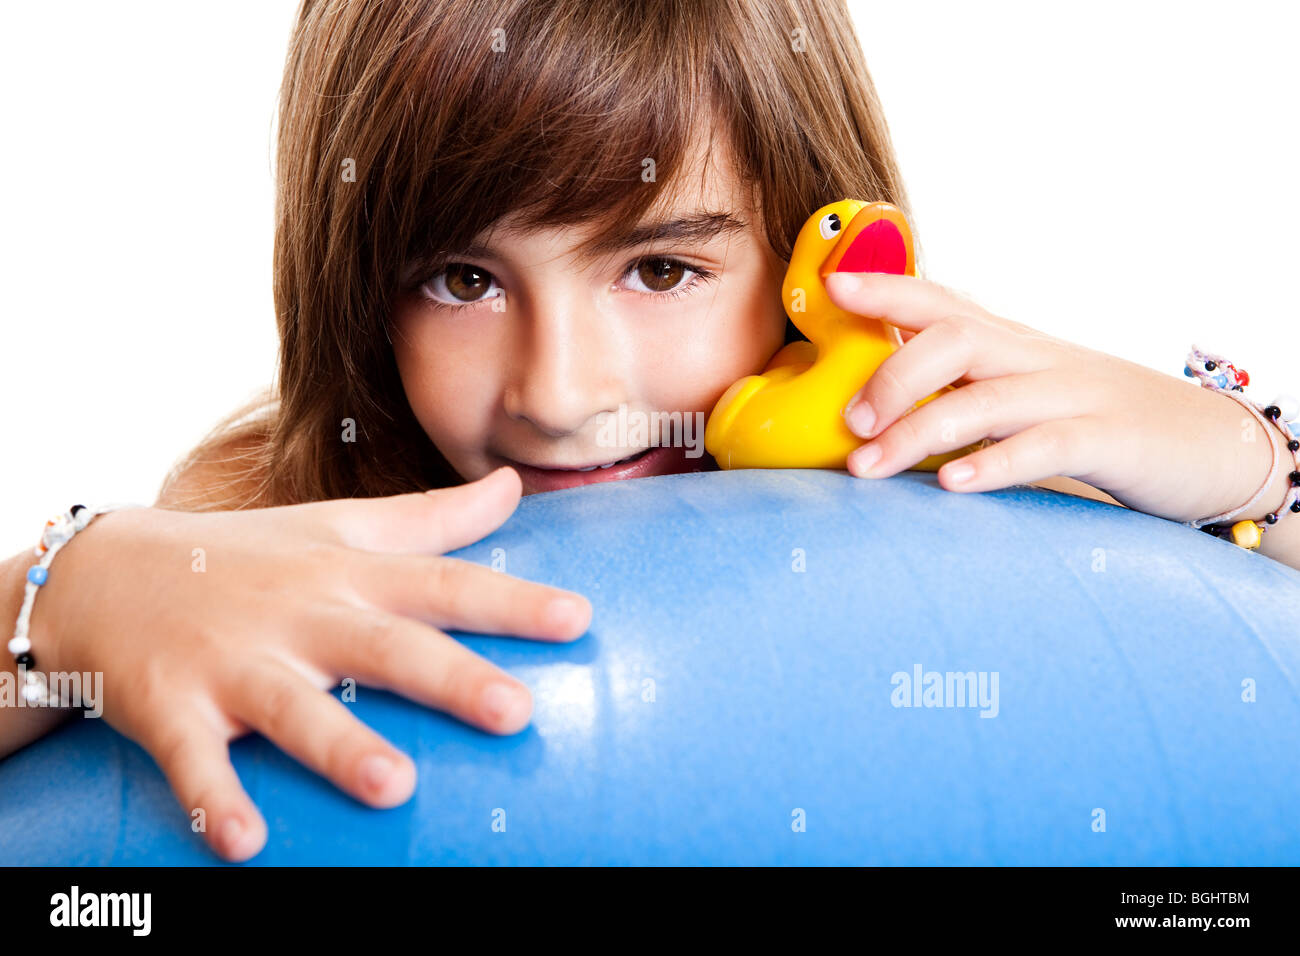 Child Game Hop Stockfotos & Child Game Hop Bilder - Alamy